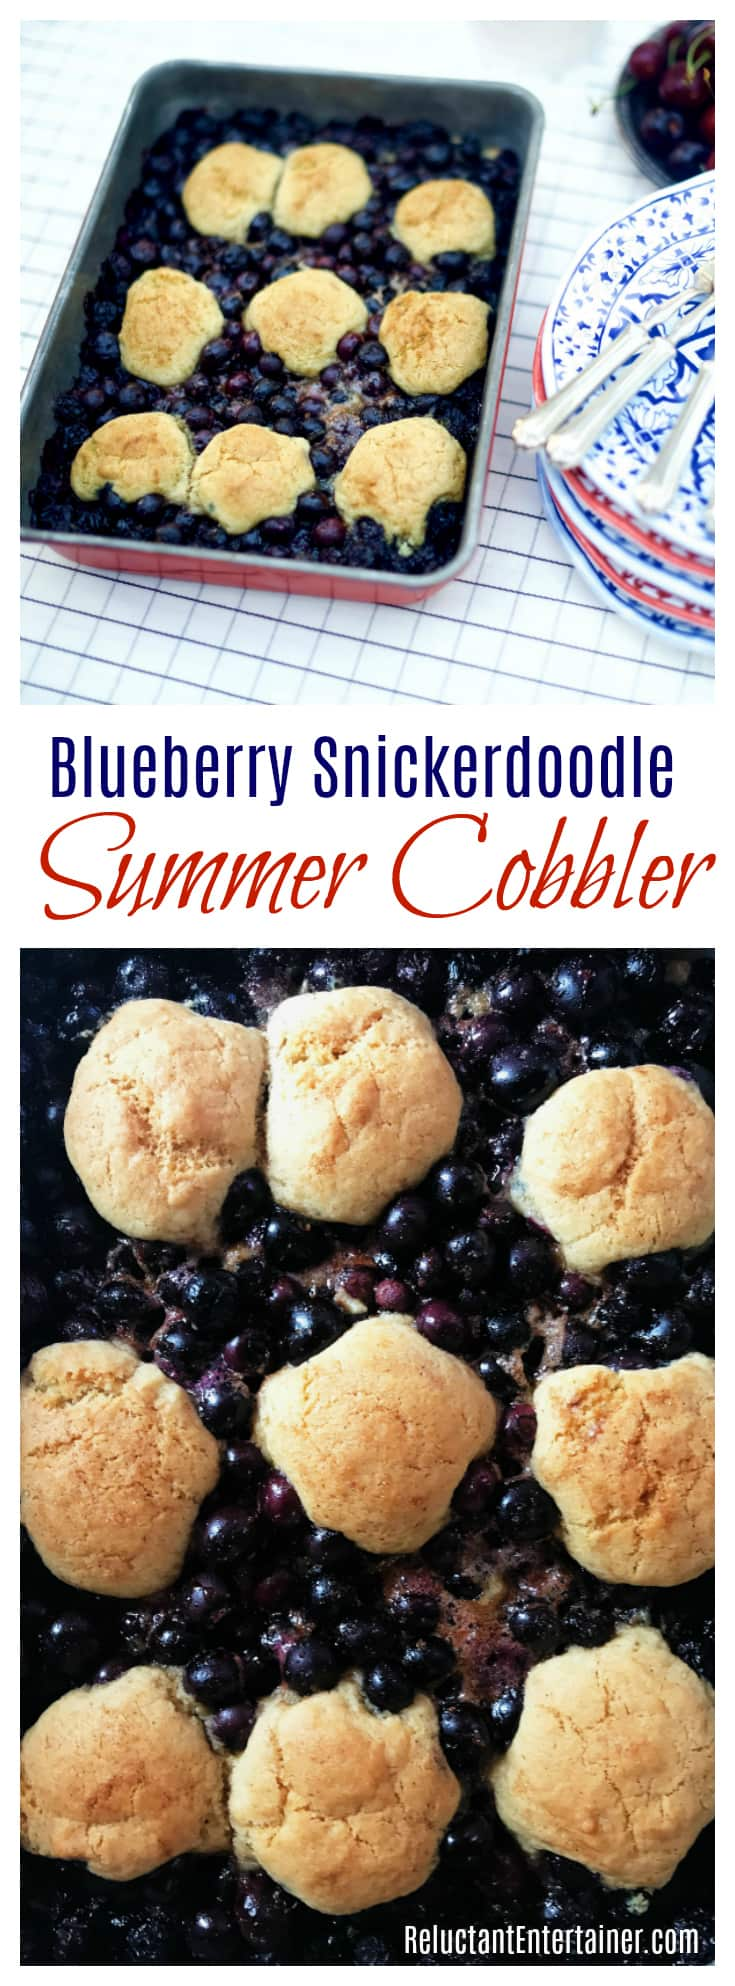 Blueberry Snickerdoodle Summer Cobbler